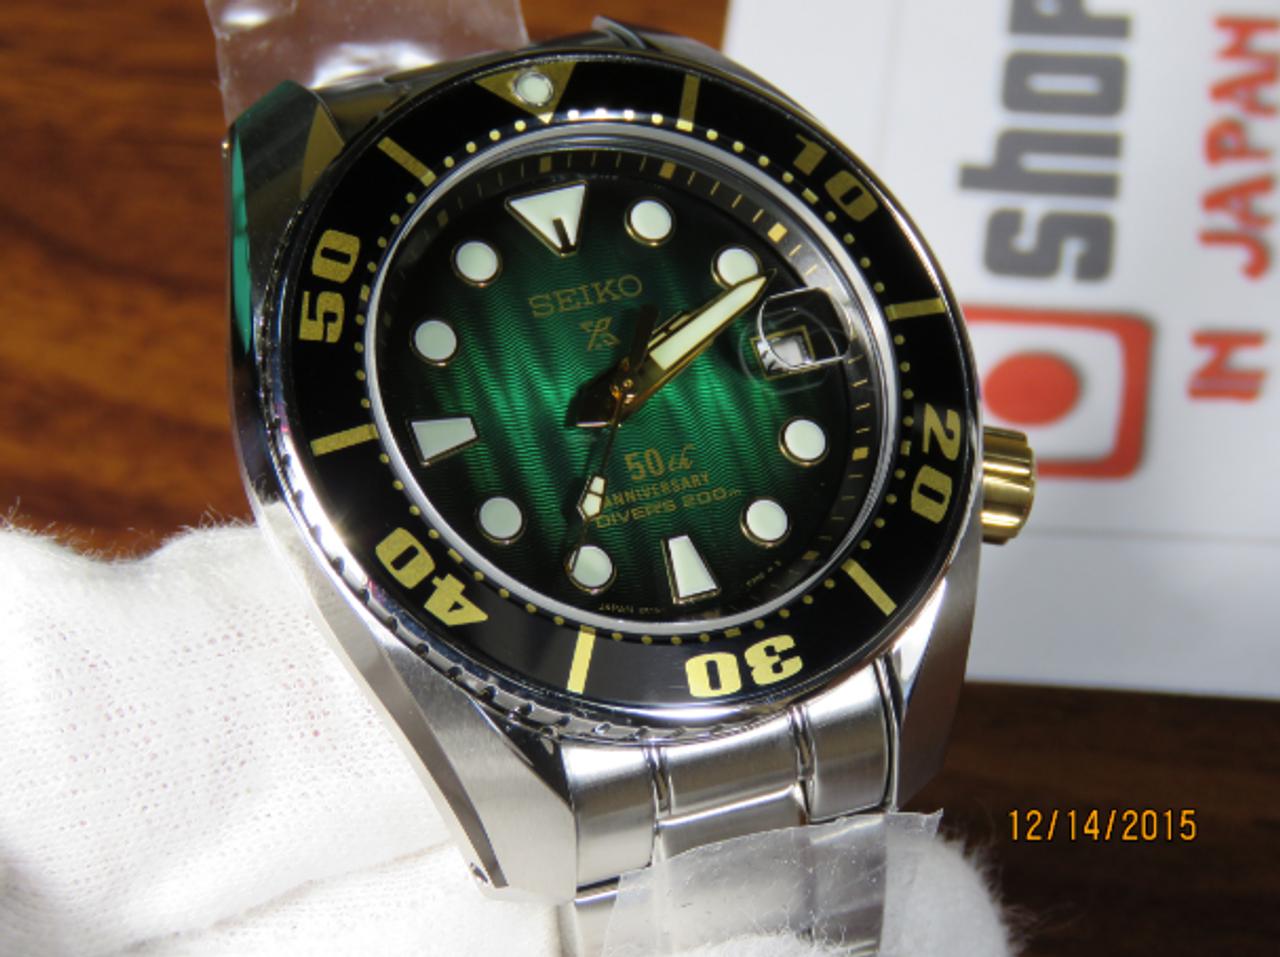 Seiko SPB031 Green Sumo